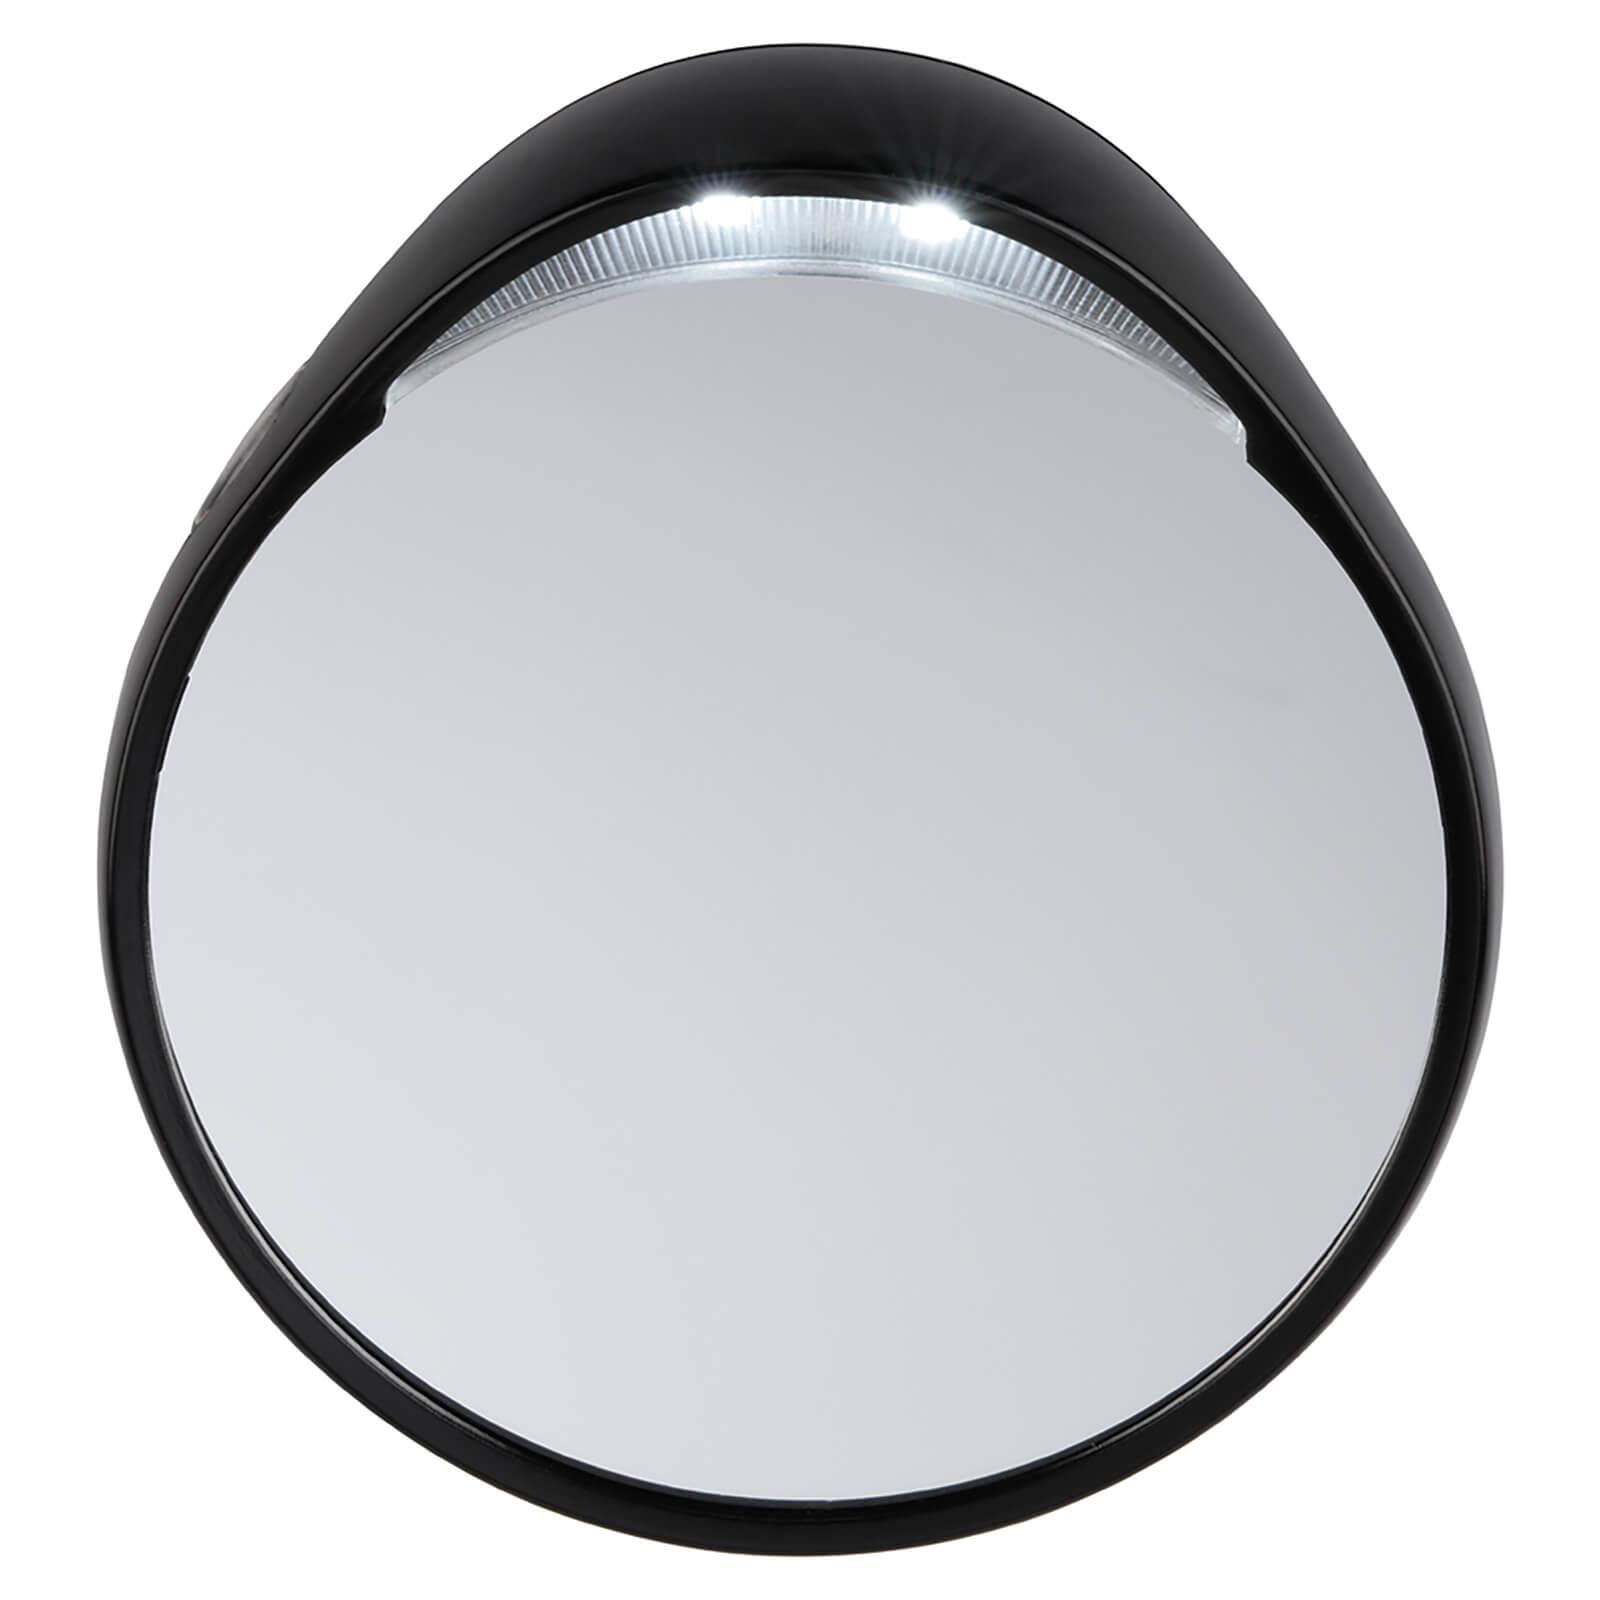 Tweezerman Tweezermate Small Round 10x Magnifying Lighted Lit Travel Mirror